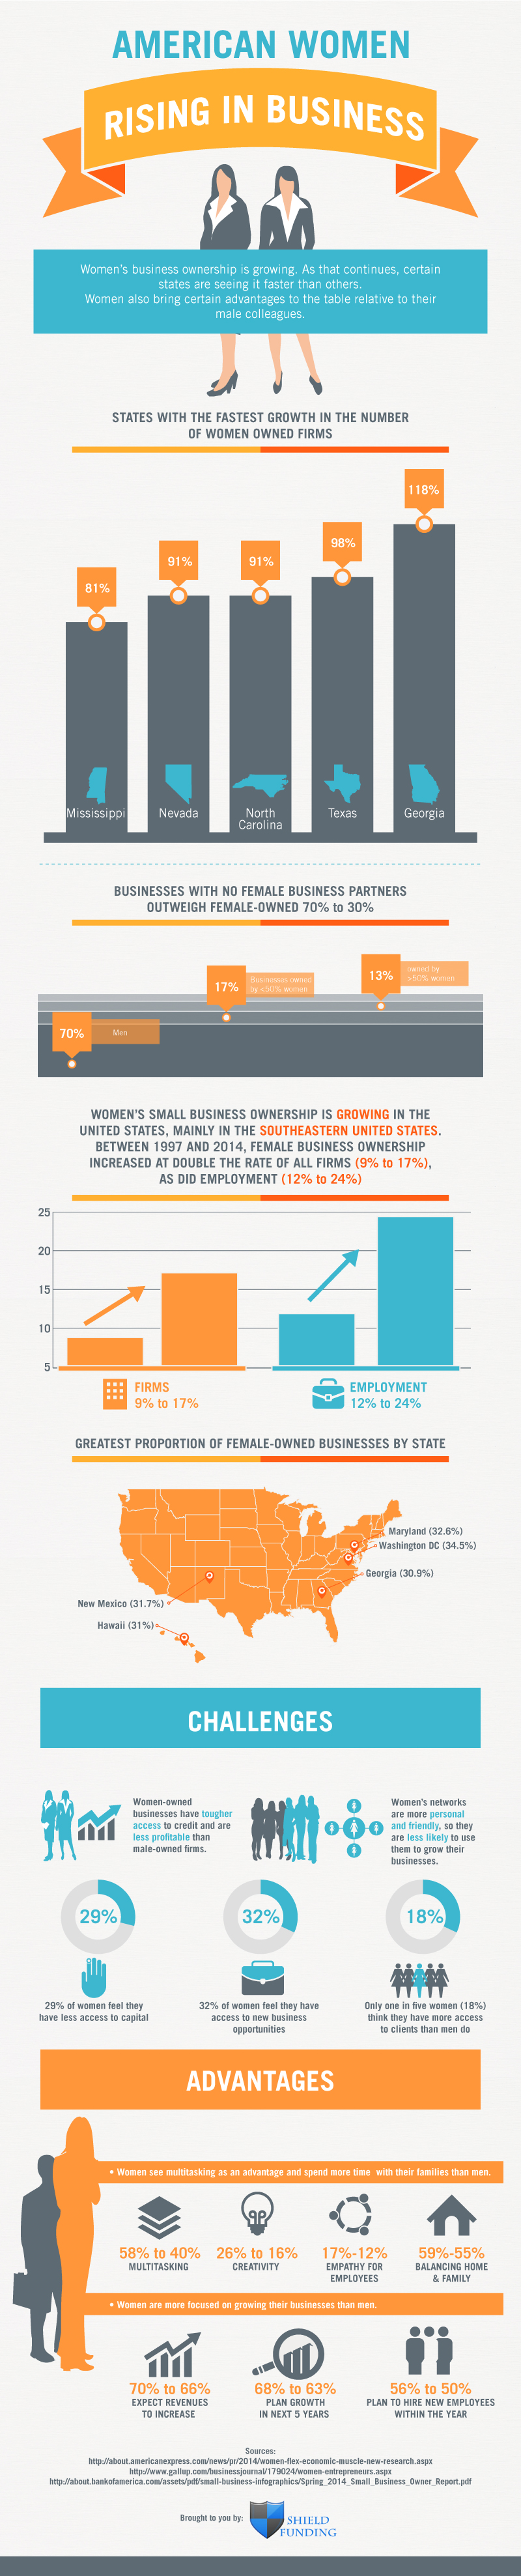 American Women Rising in Business by Shield Funding